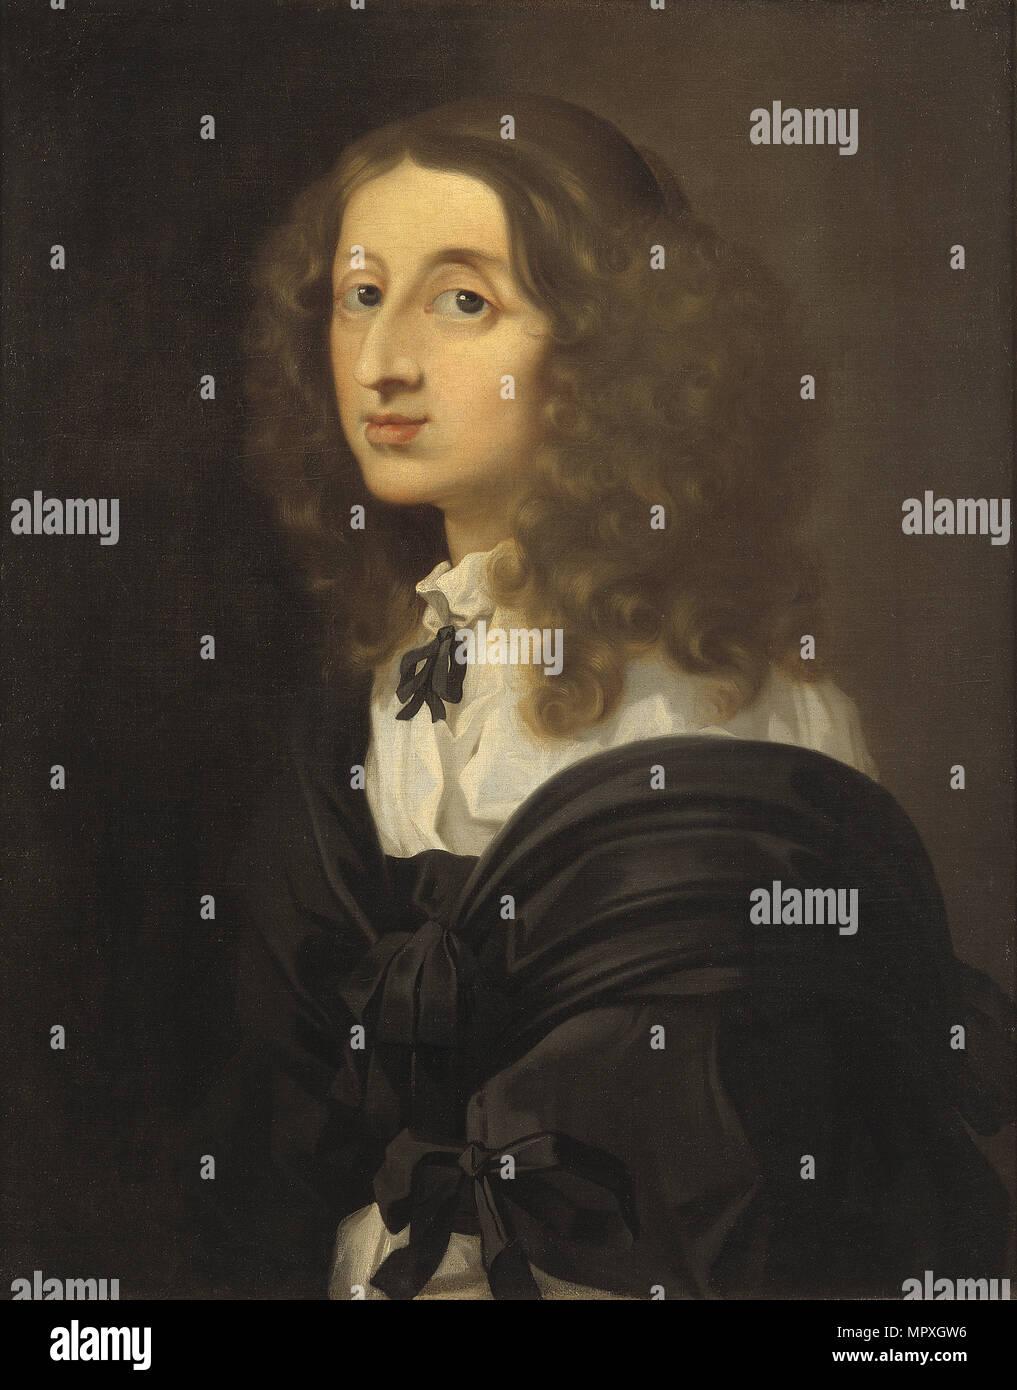 Portrait of Queen Christina of Sweden (1626-1689). - Stock Image